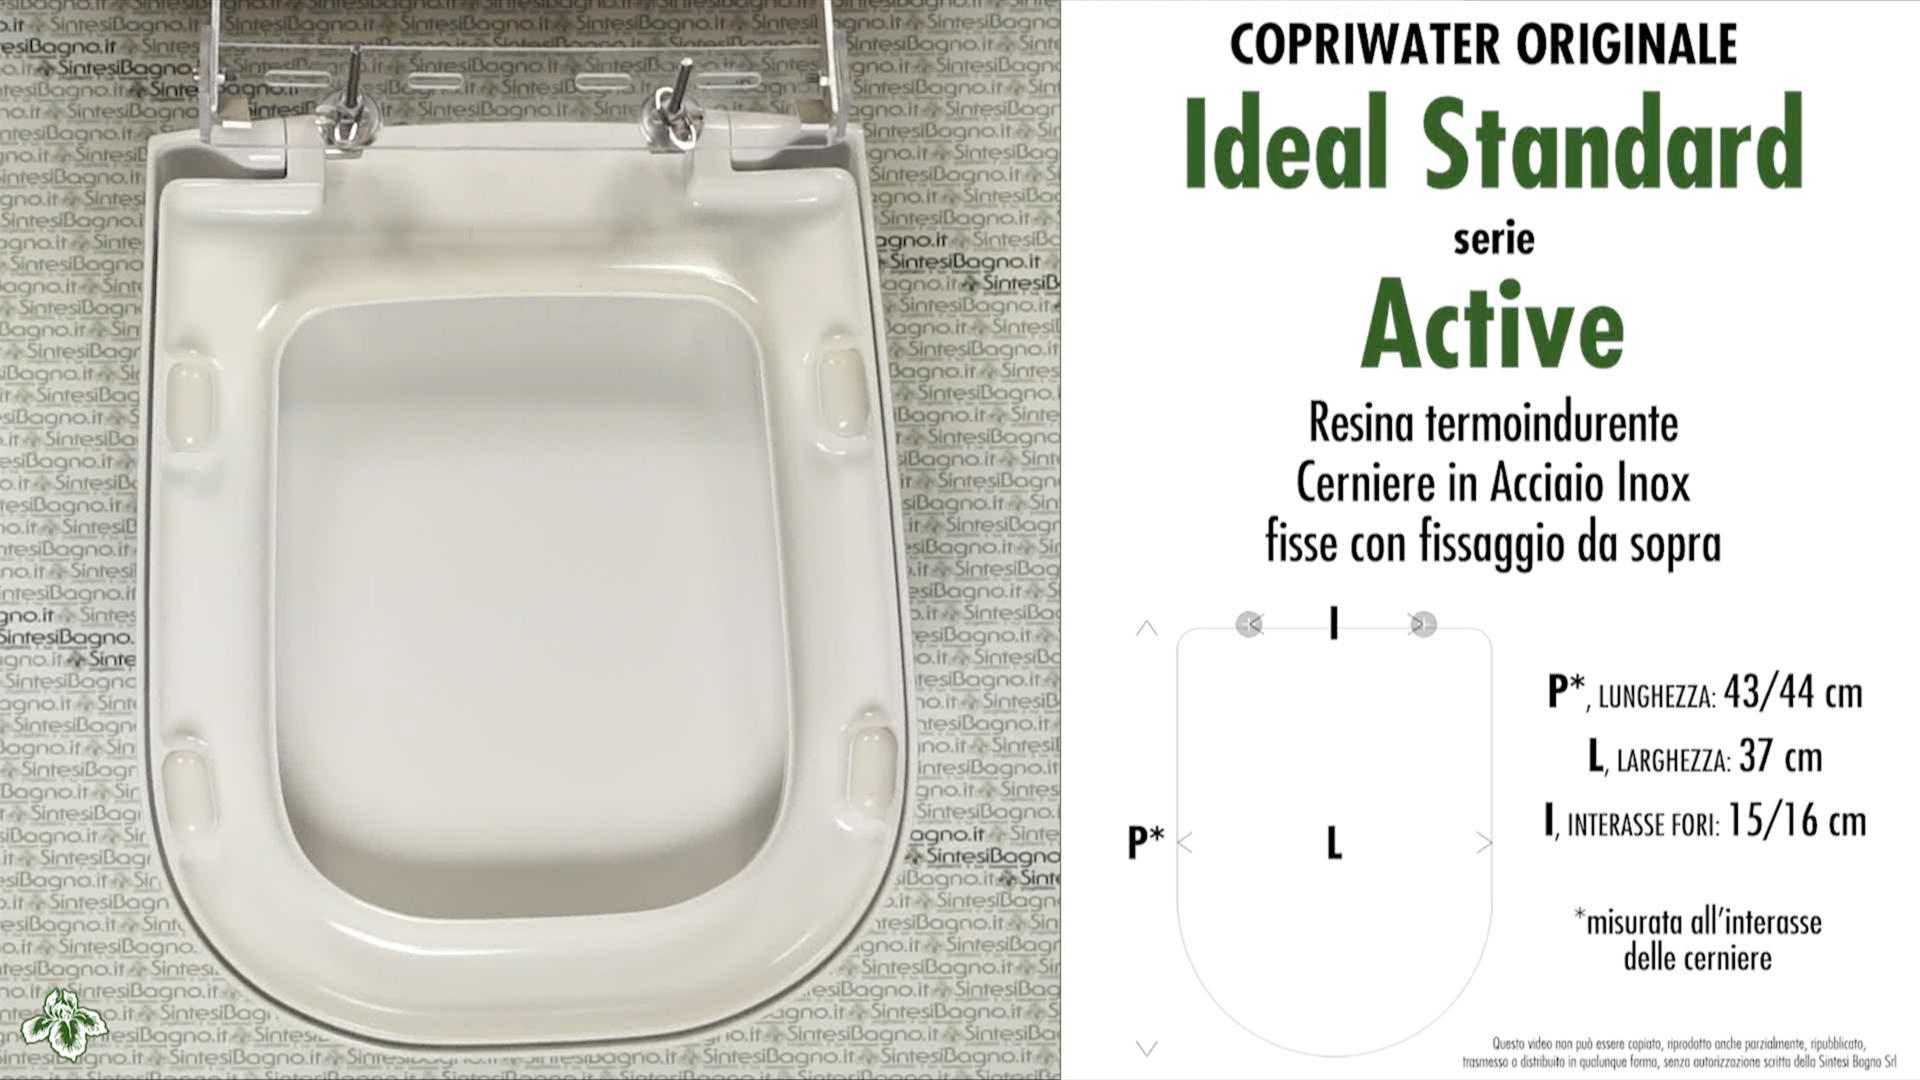 Schede tecniche misure copriwater ideal standard serie active for Calla ideal standard scheda tecnica